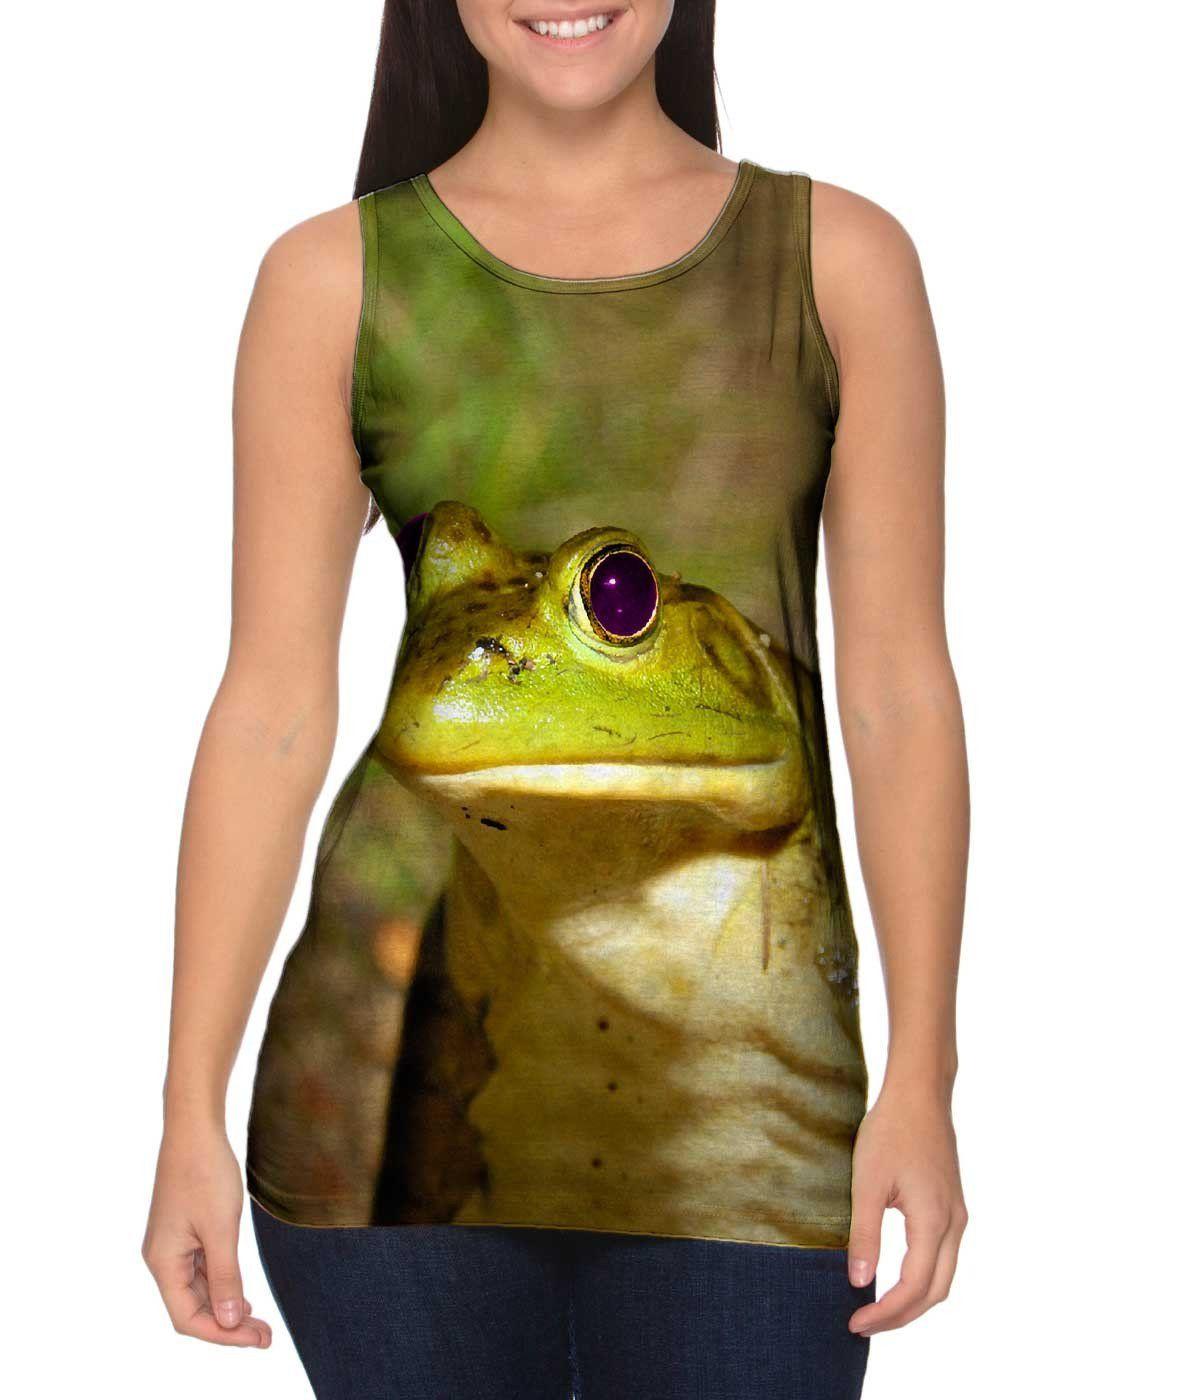 Purple Eyed Frog